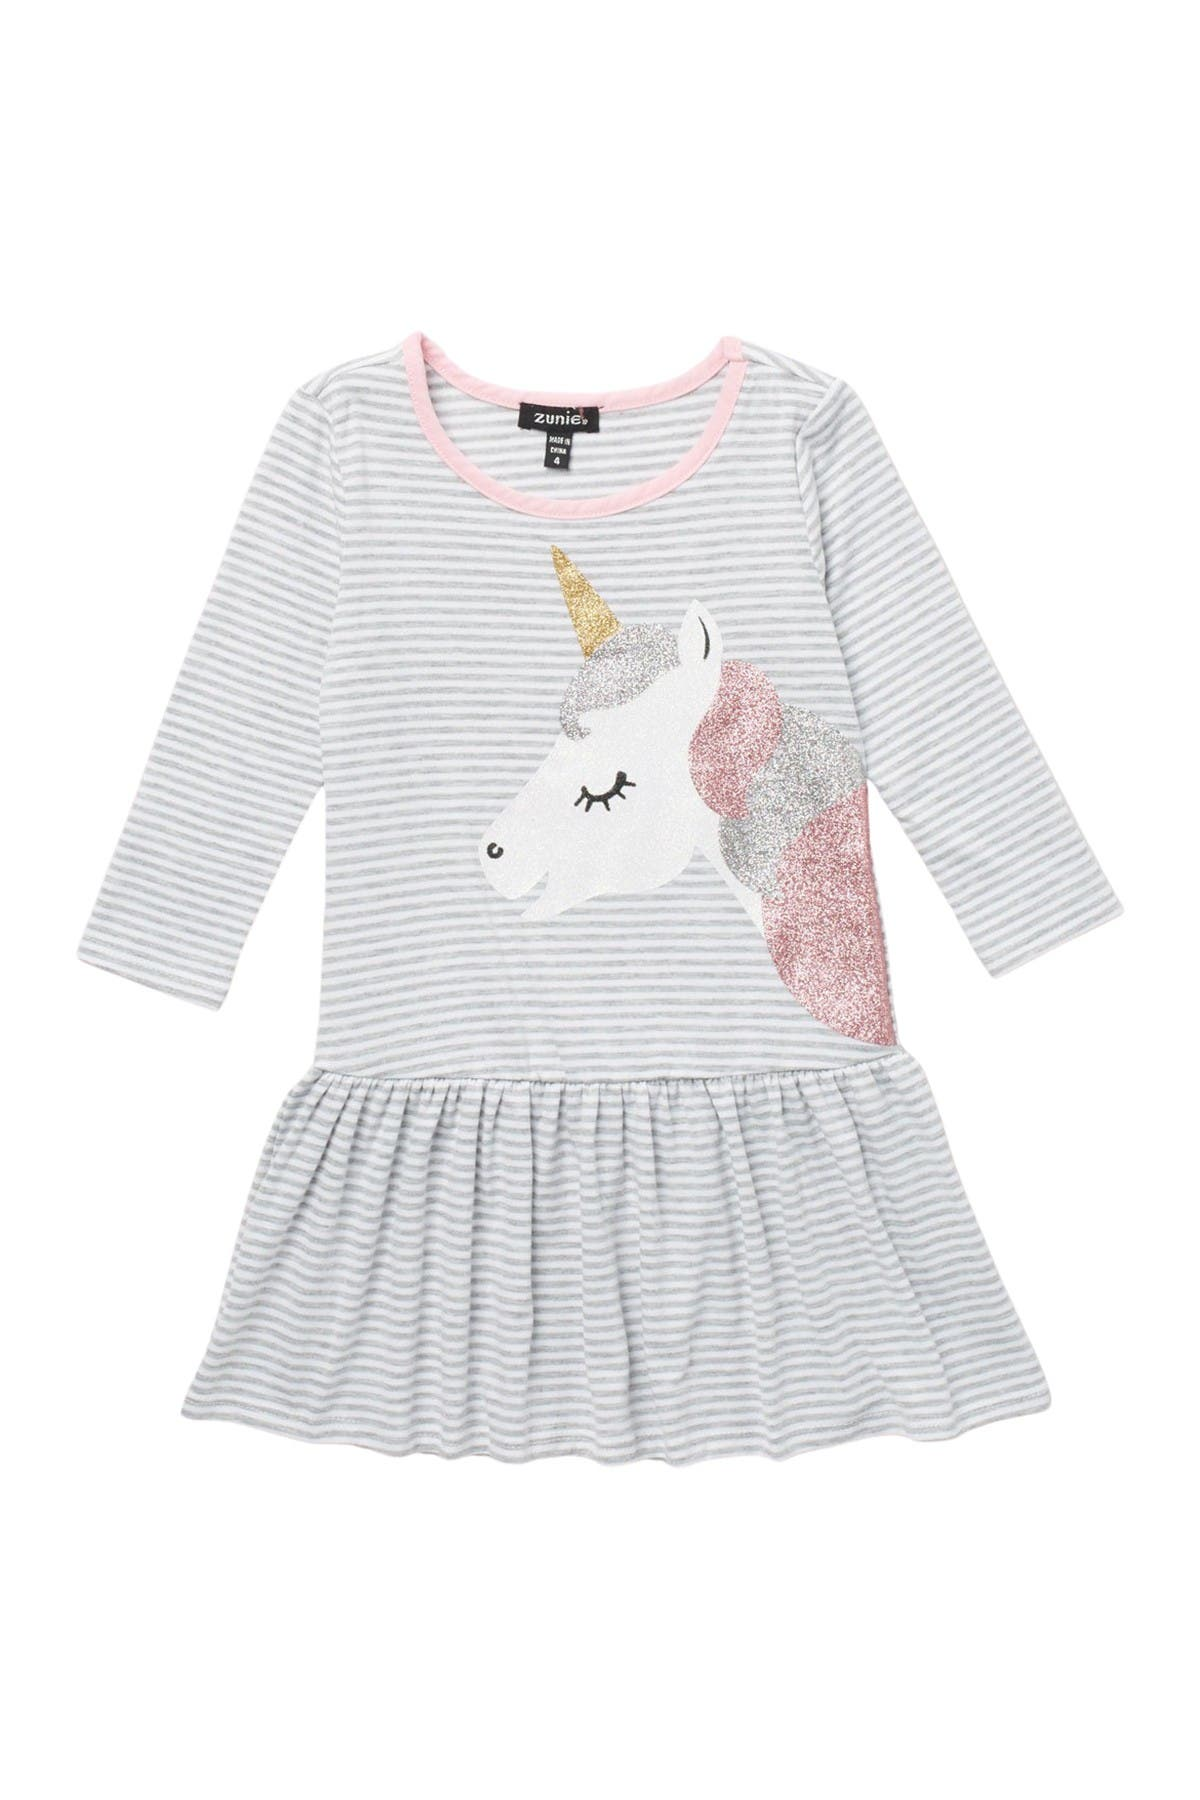 Image of Zunie Glitter Unicorn Striped Long Sleeve Dress